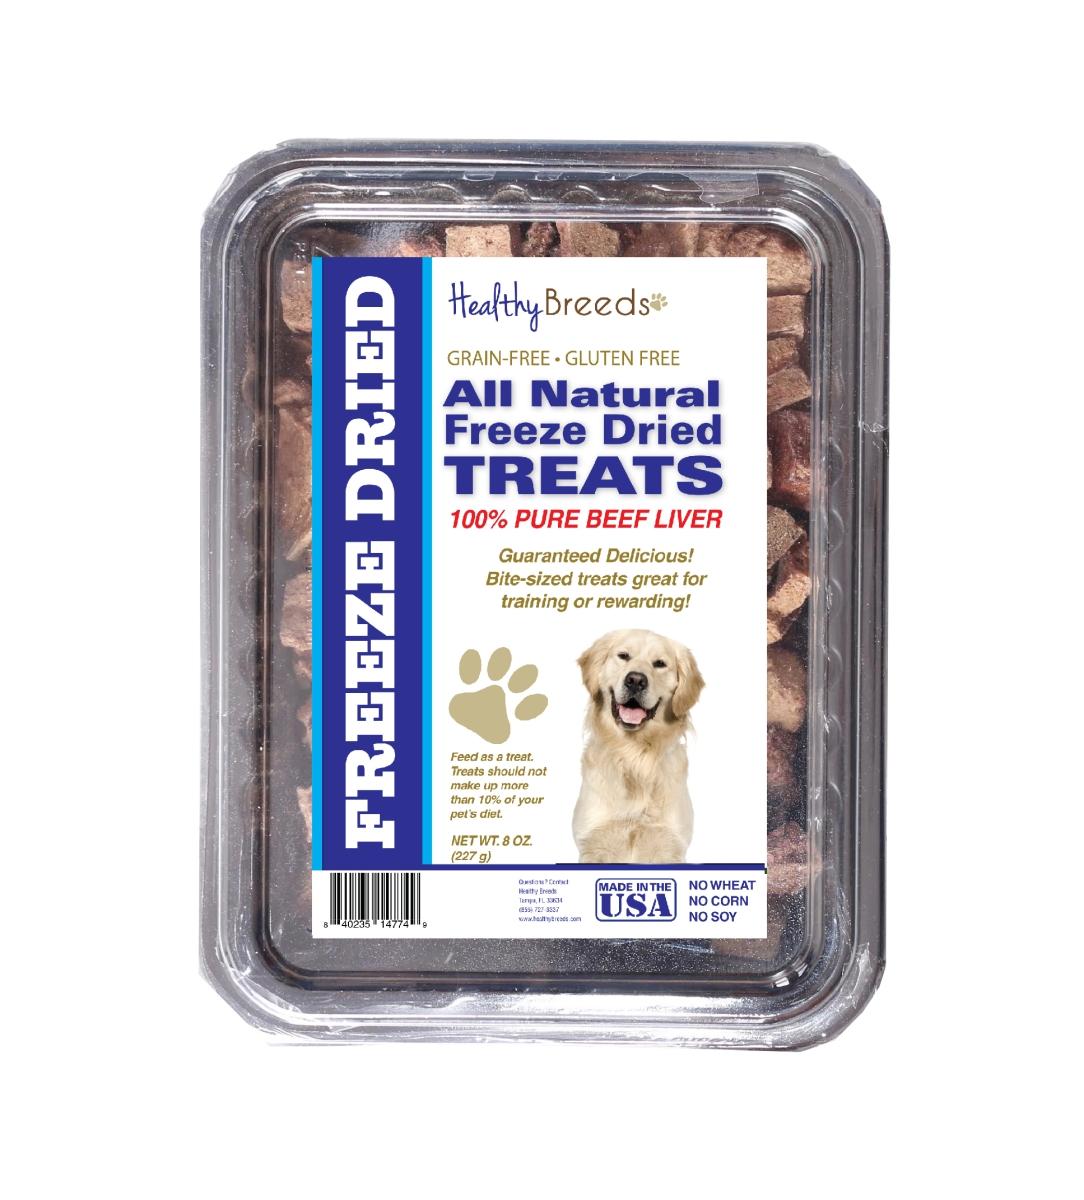 Healthy Breeds 840235147879 10 oz Golden Retriever All Natural Freeze Dried Treats Beef Liver